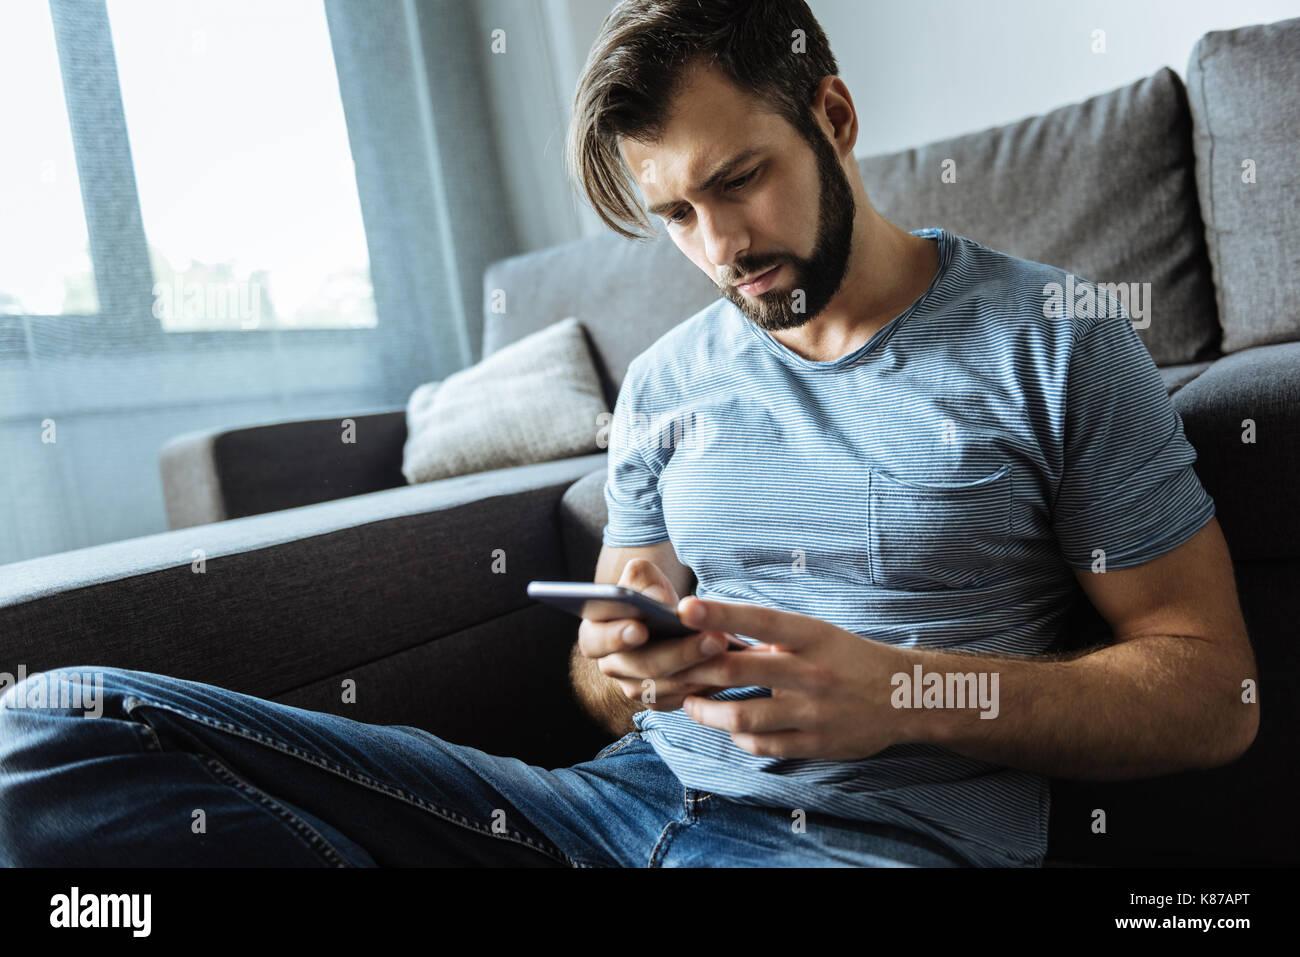 Unhappy sad man using his smartphone Stock Photo